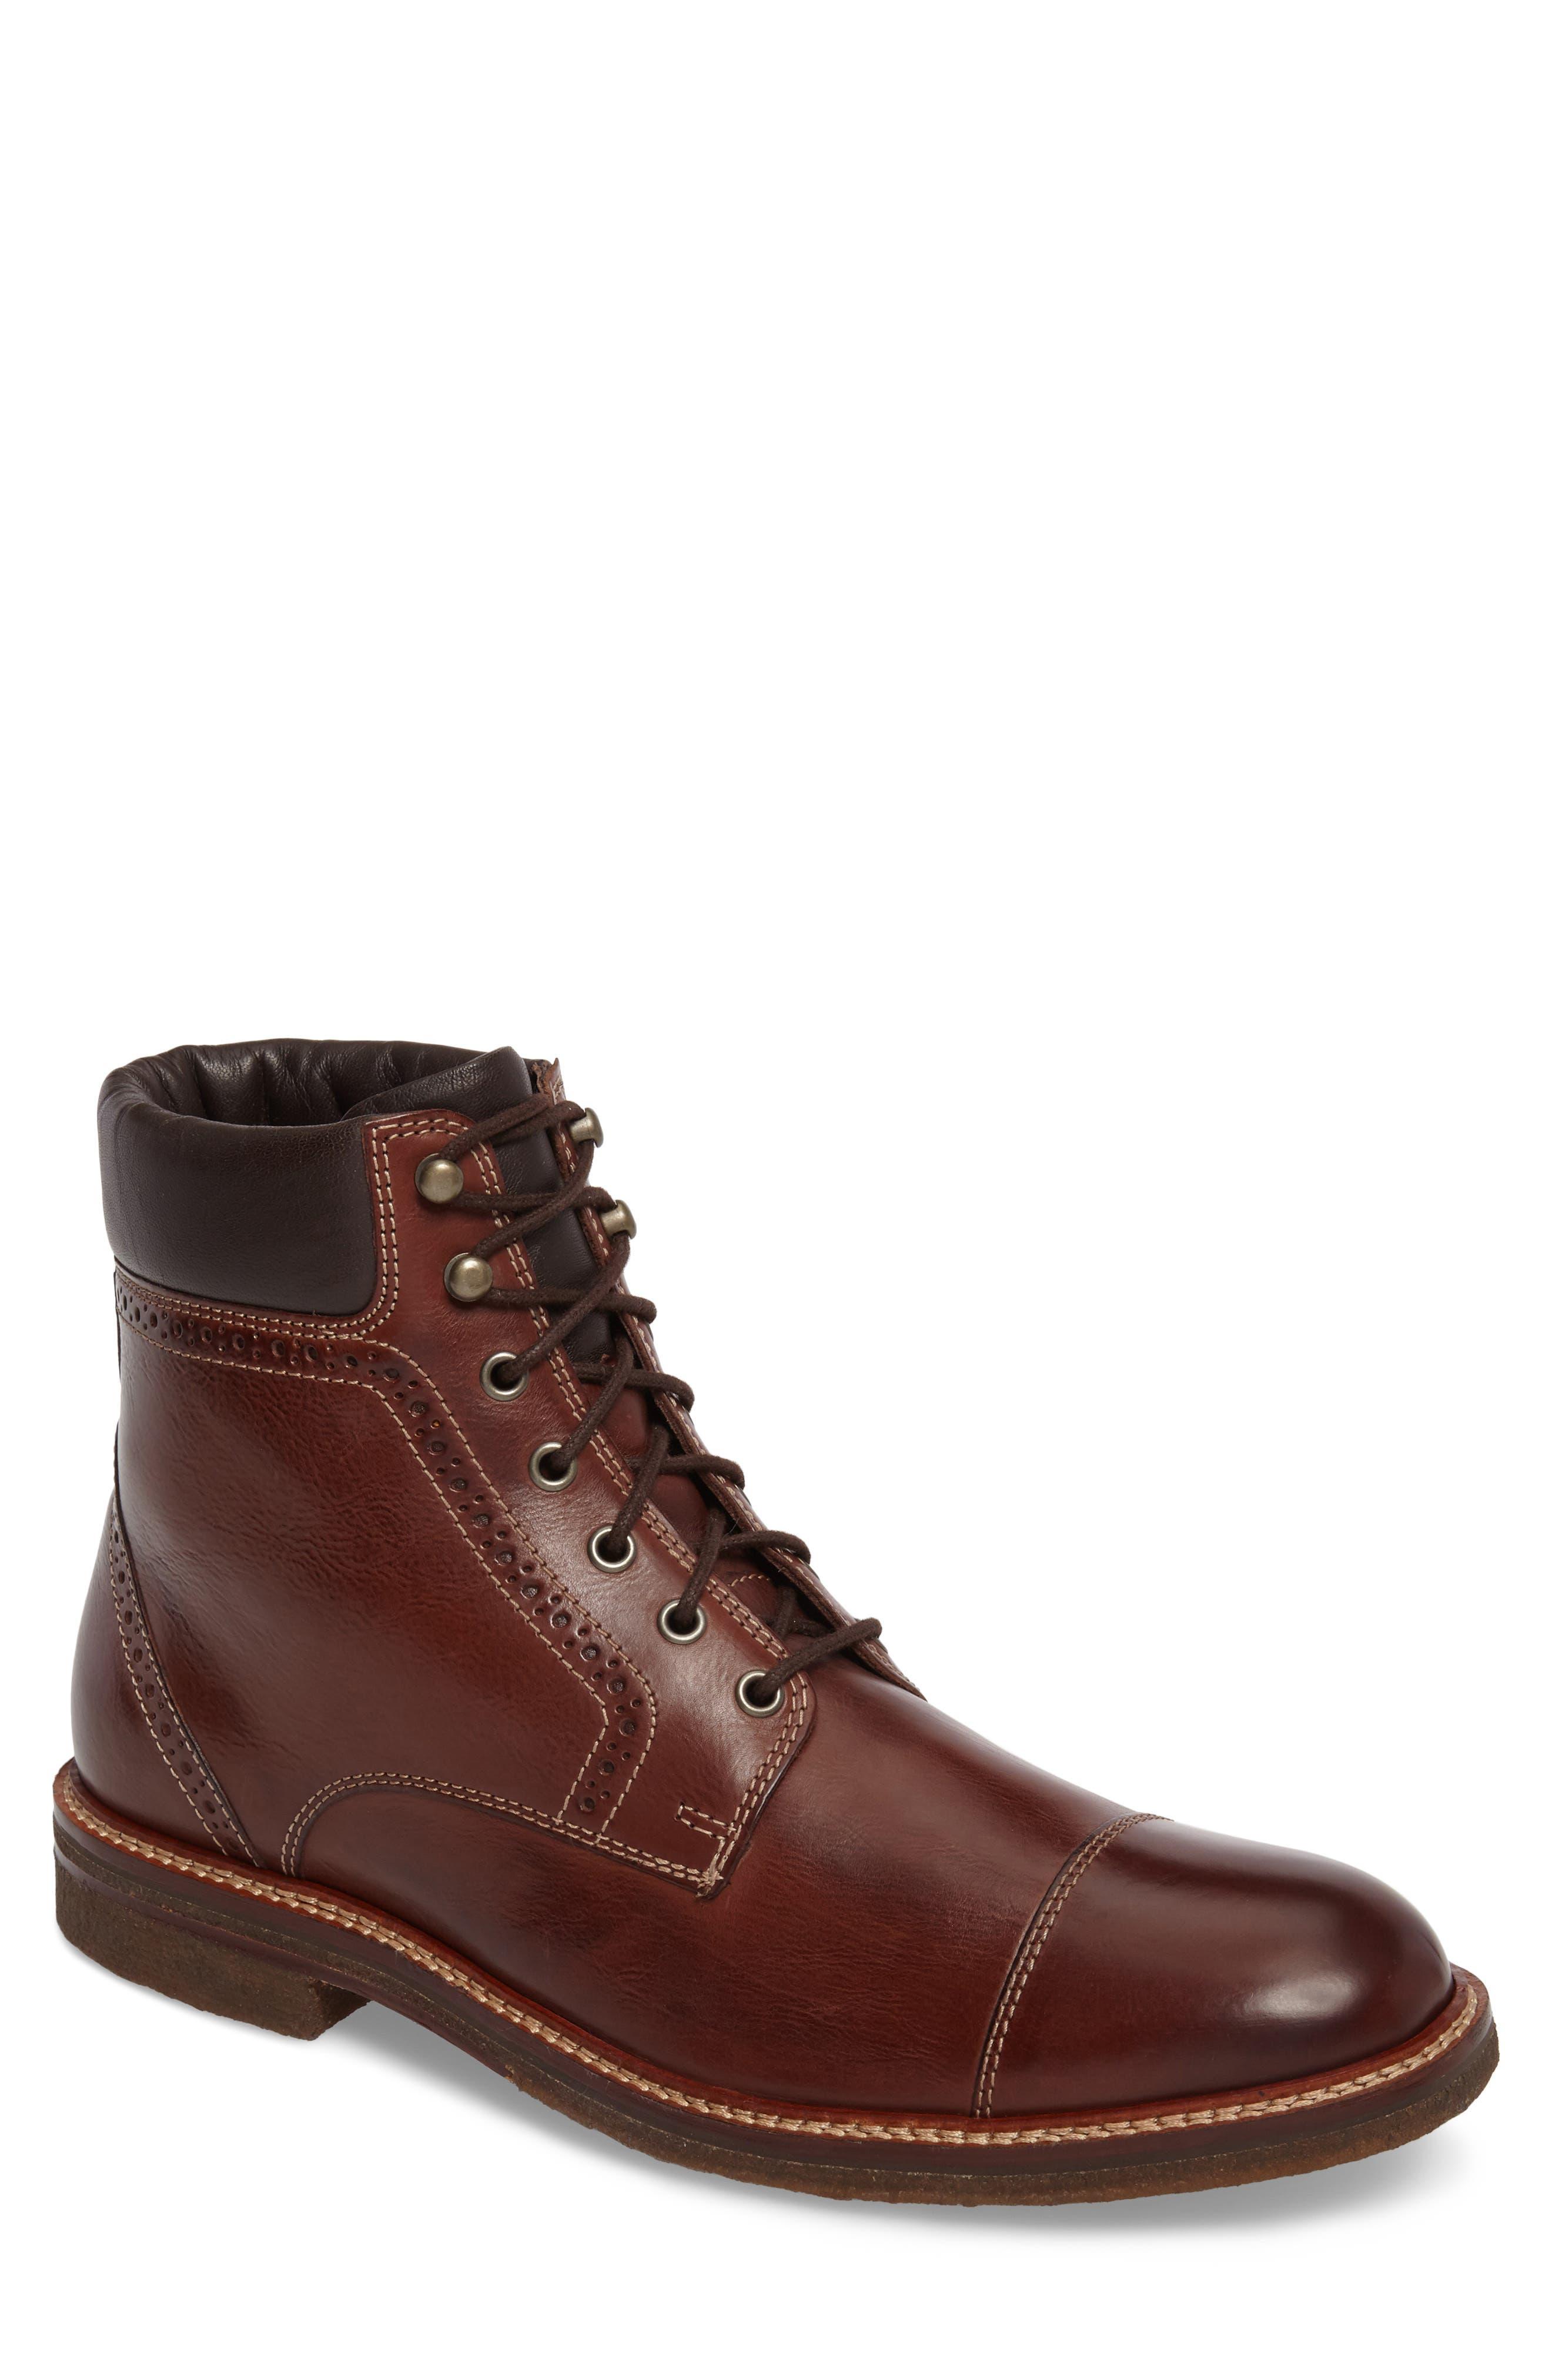 Forrester Cap Toe Boot,                             Main thumbnail 1, color,                             Mahogany Leather